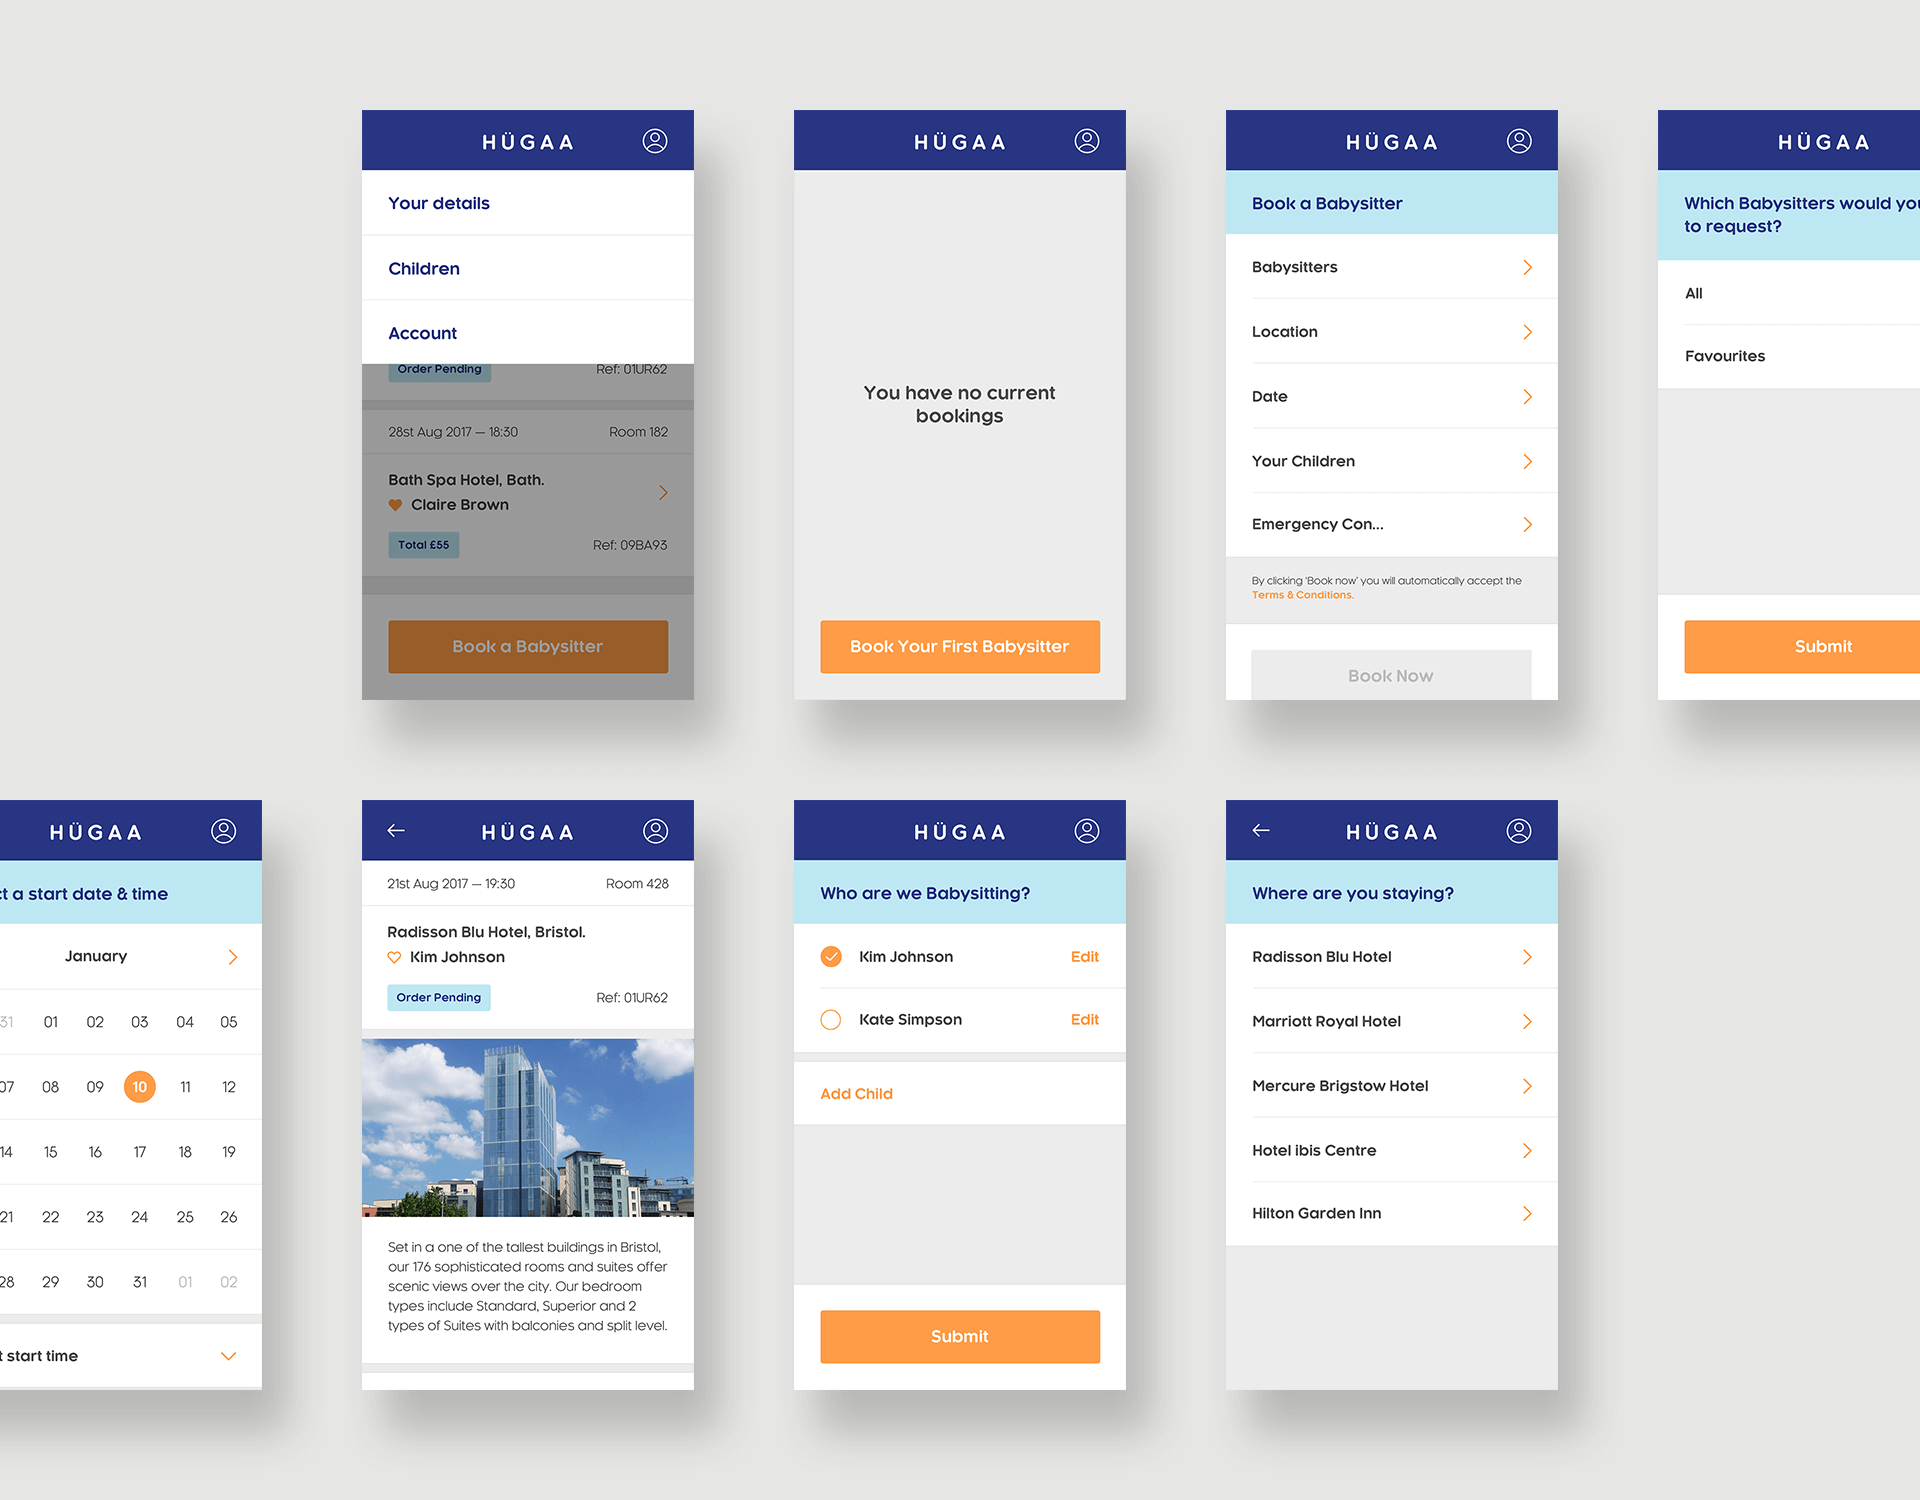 Mobile UI Designs For Hugaa